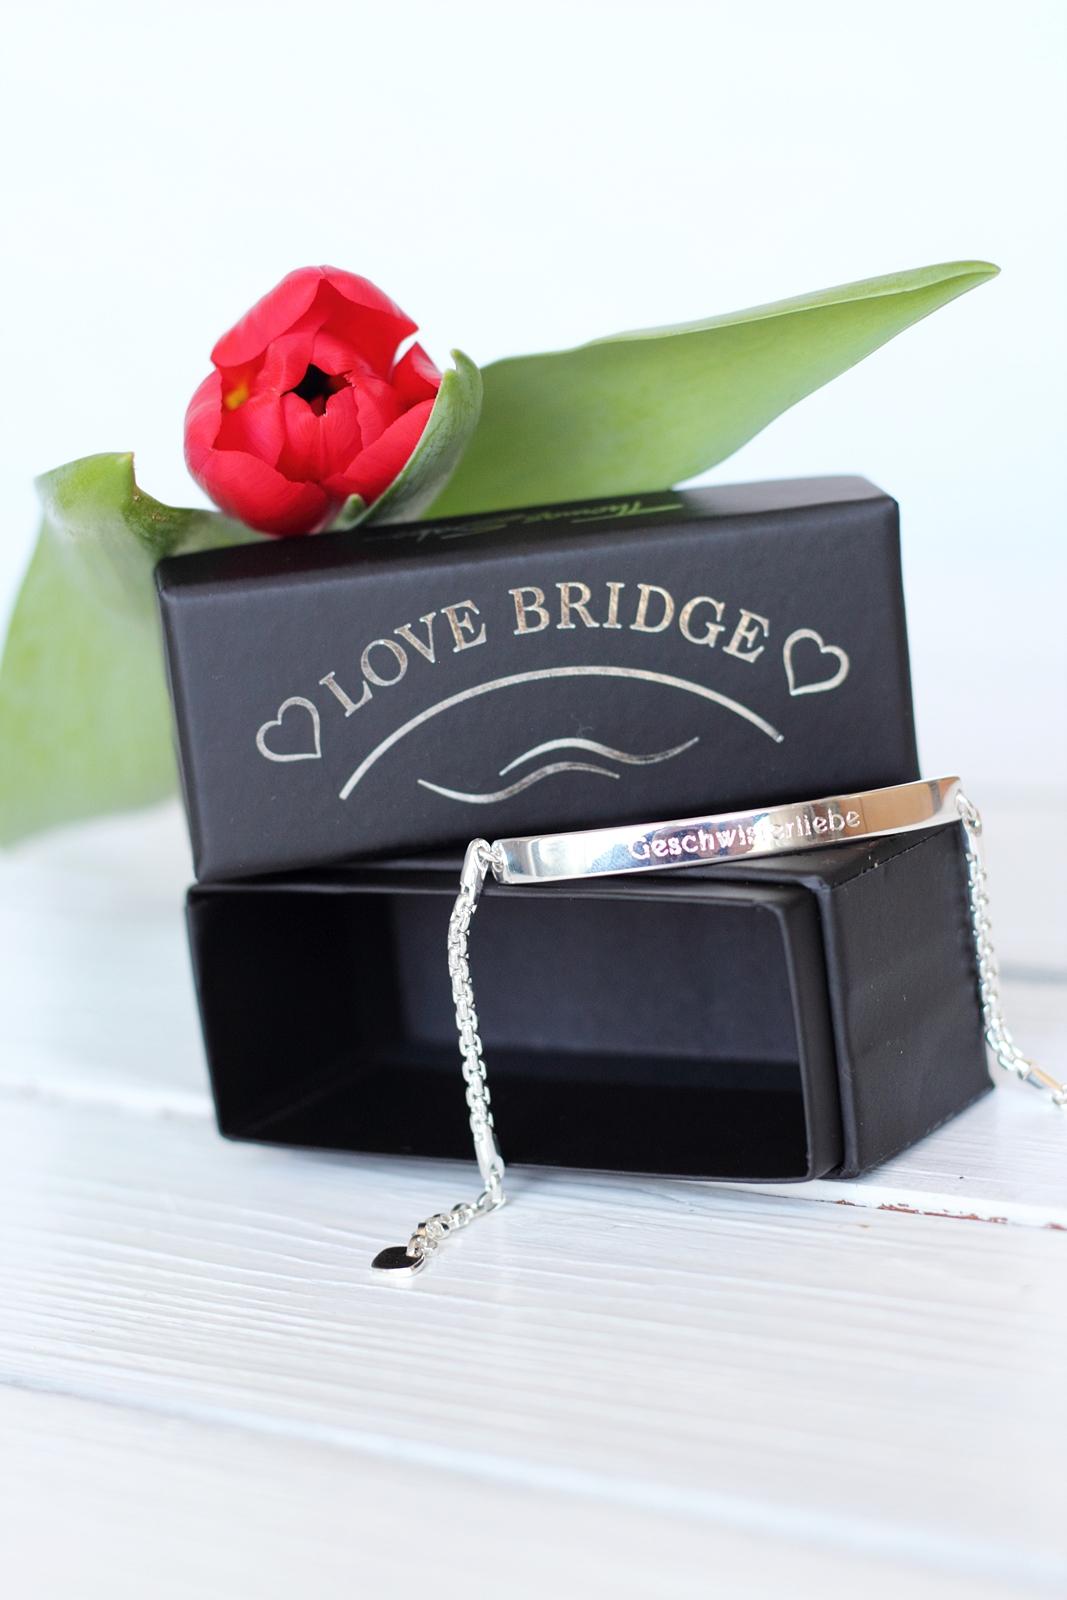 thomas sabo love bridge valentinstag geschwisterliebe 18. Black Bedroom Furniture Sets. Home Design Ideas